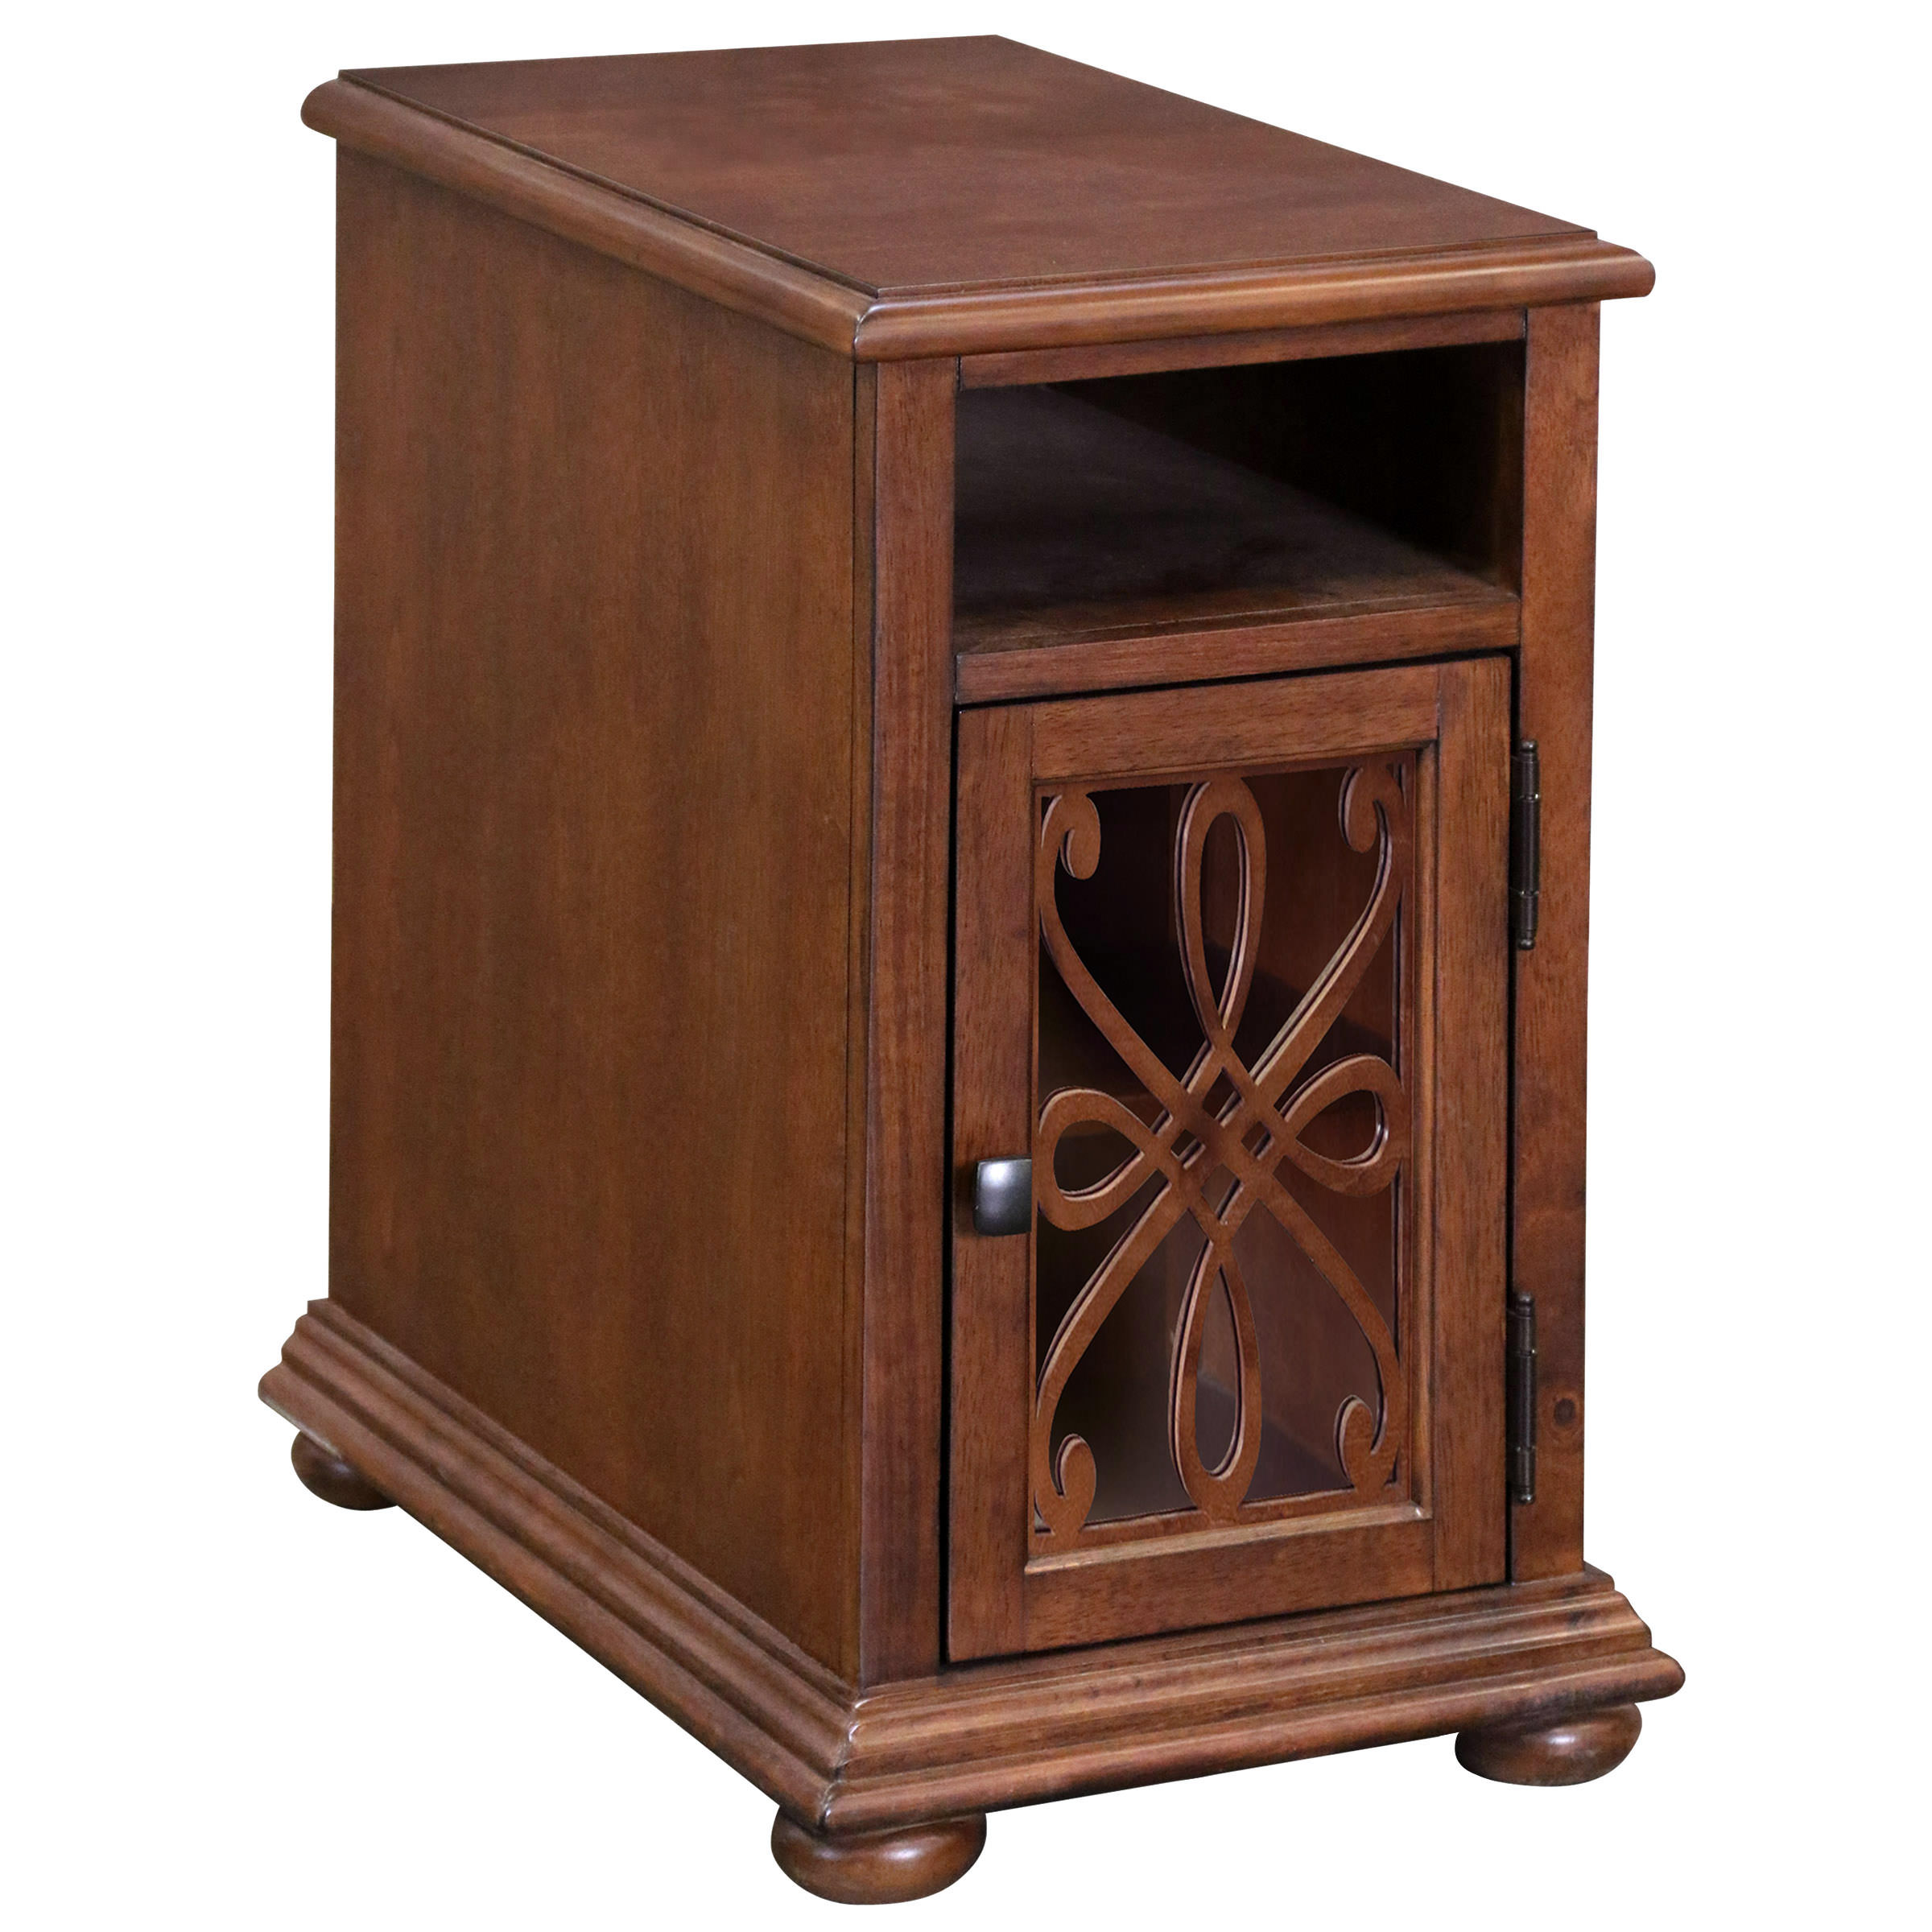 Ornate Overlay Chairside Cabinet - Cherry Finish